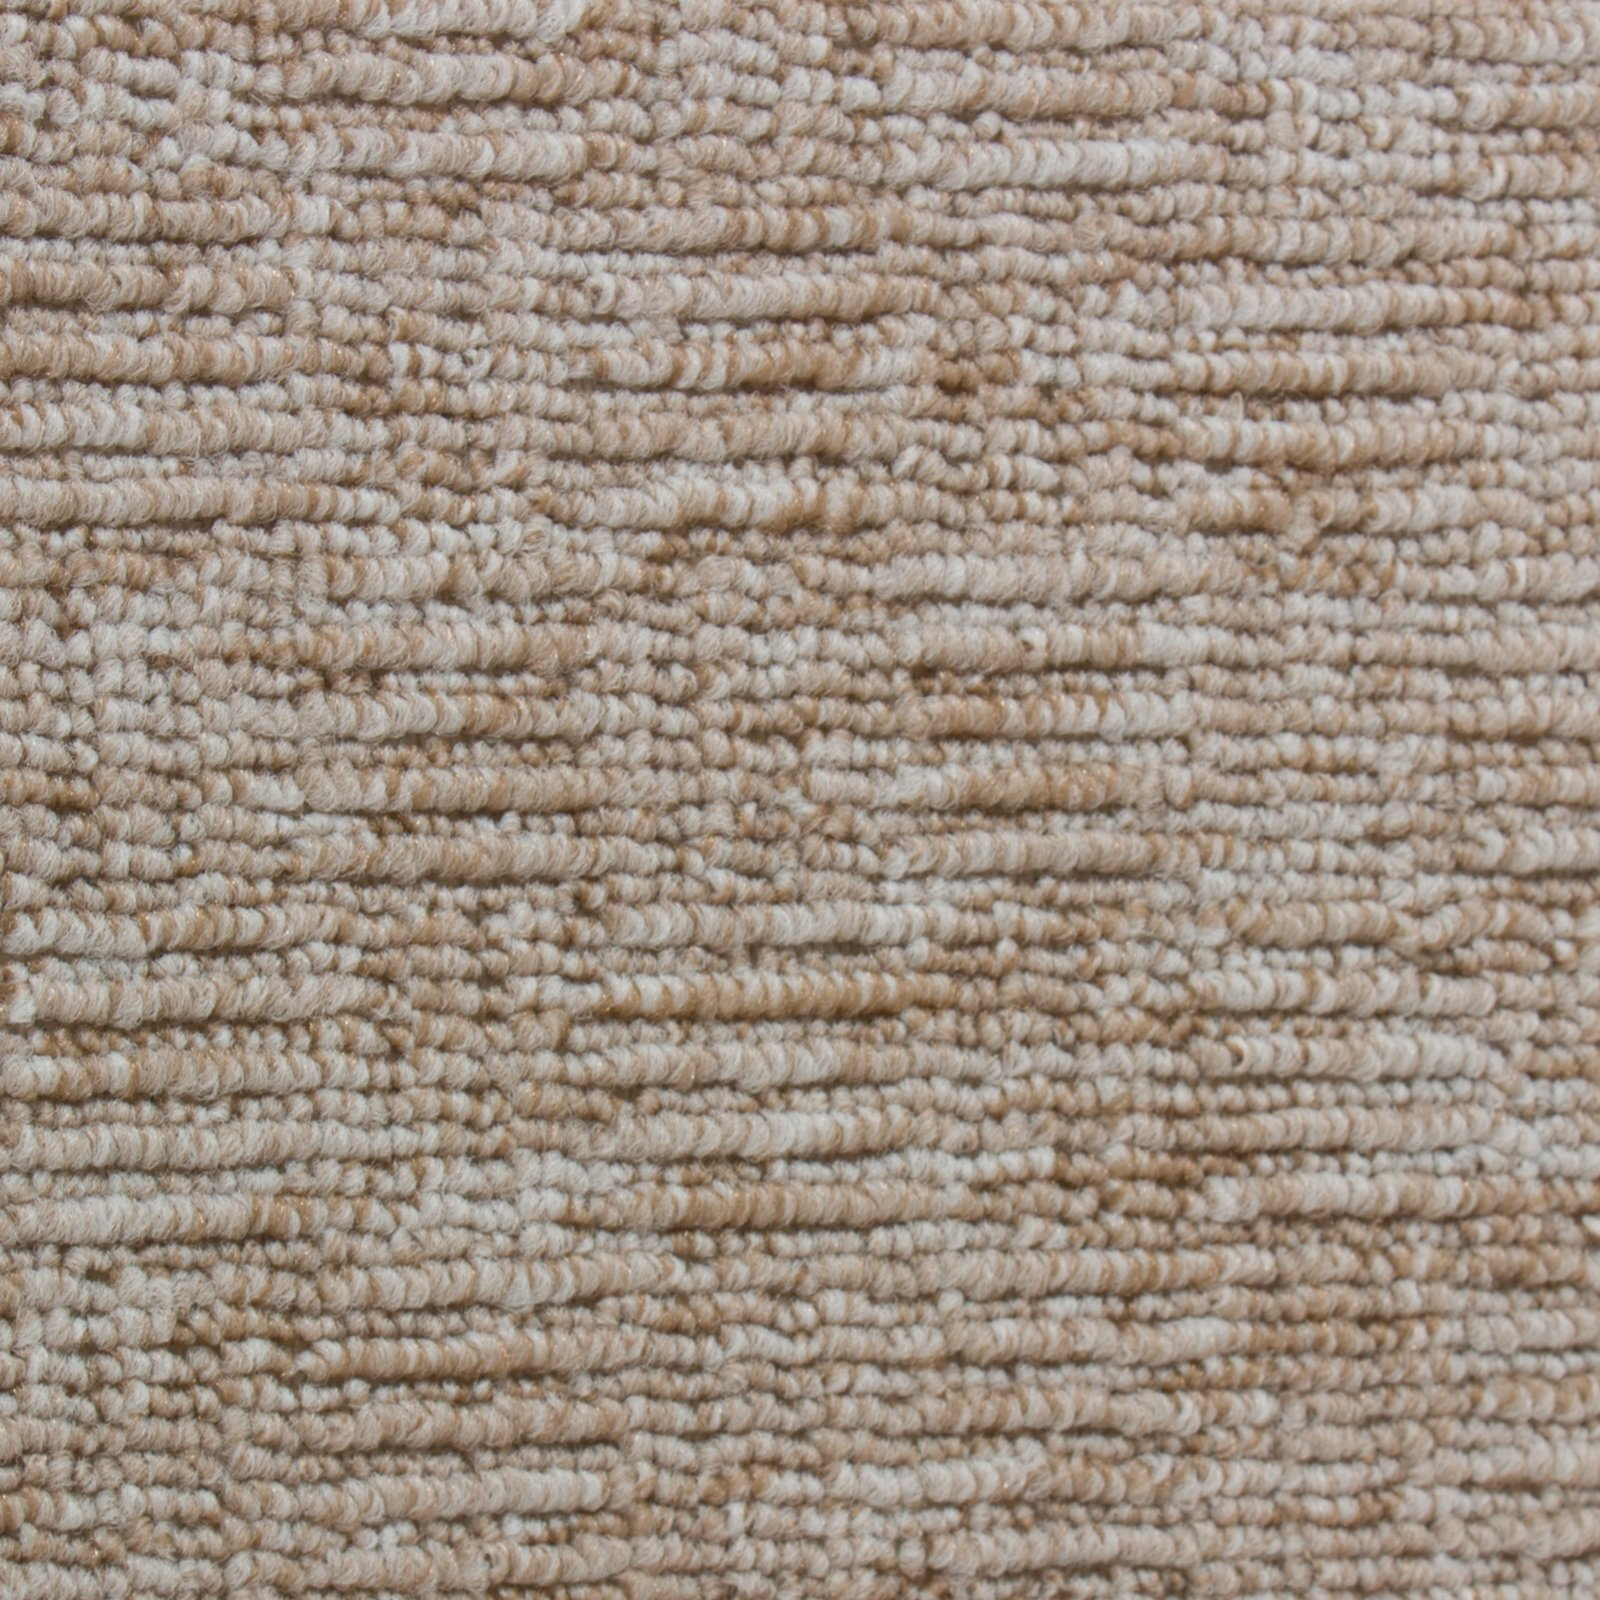 teppichboden troje beige 4 meter breit teppichboden bodenbel ge baumarkt roller. Black Bedroom Furniture Sets. Home Design Ideas